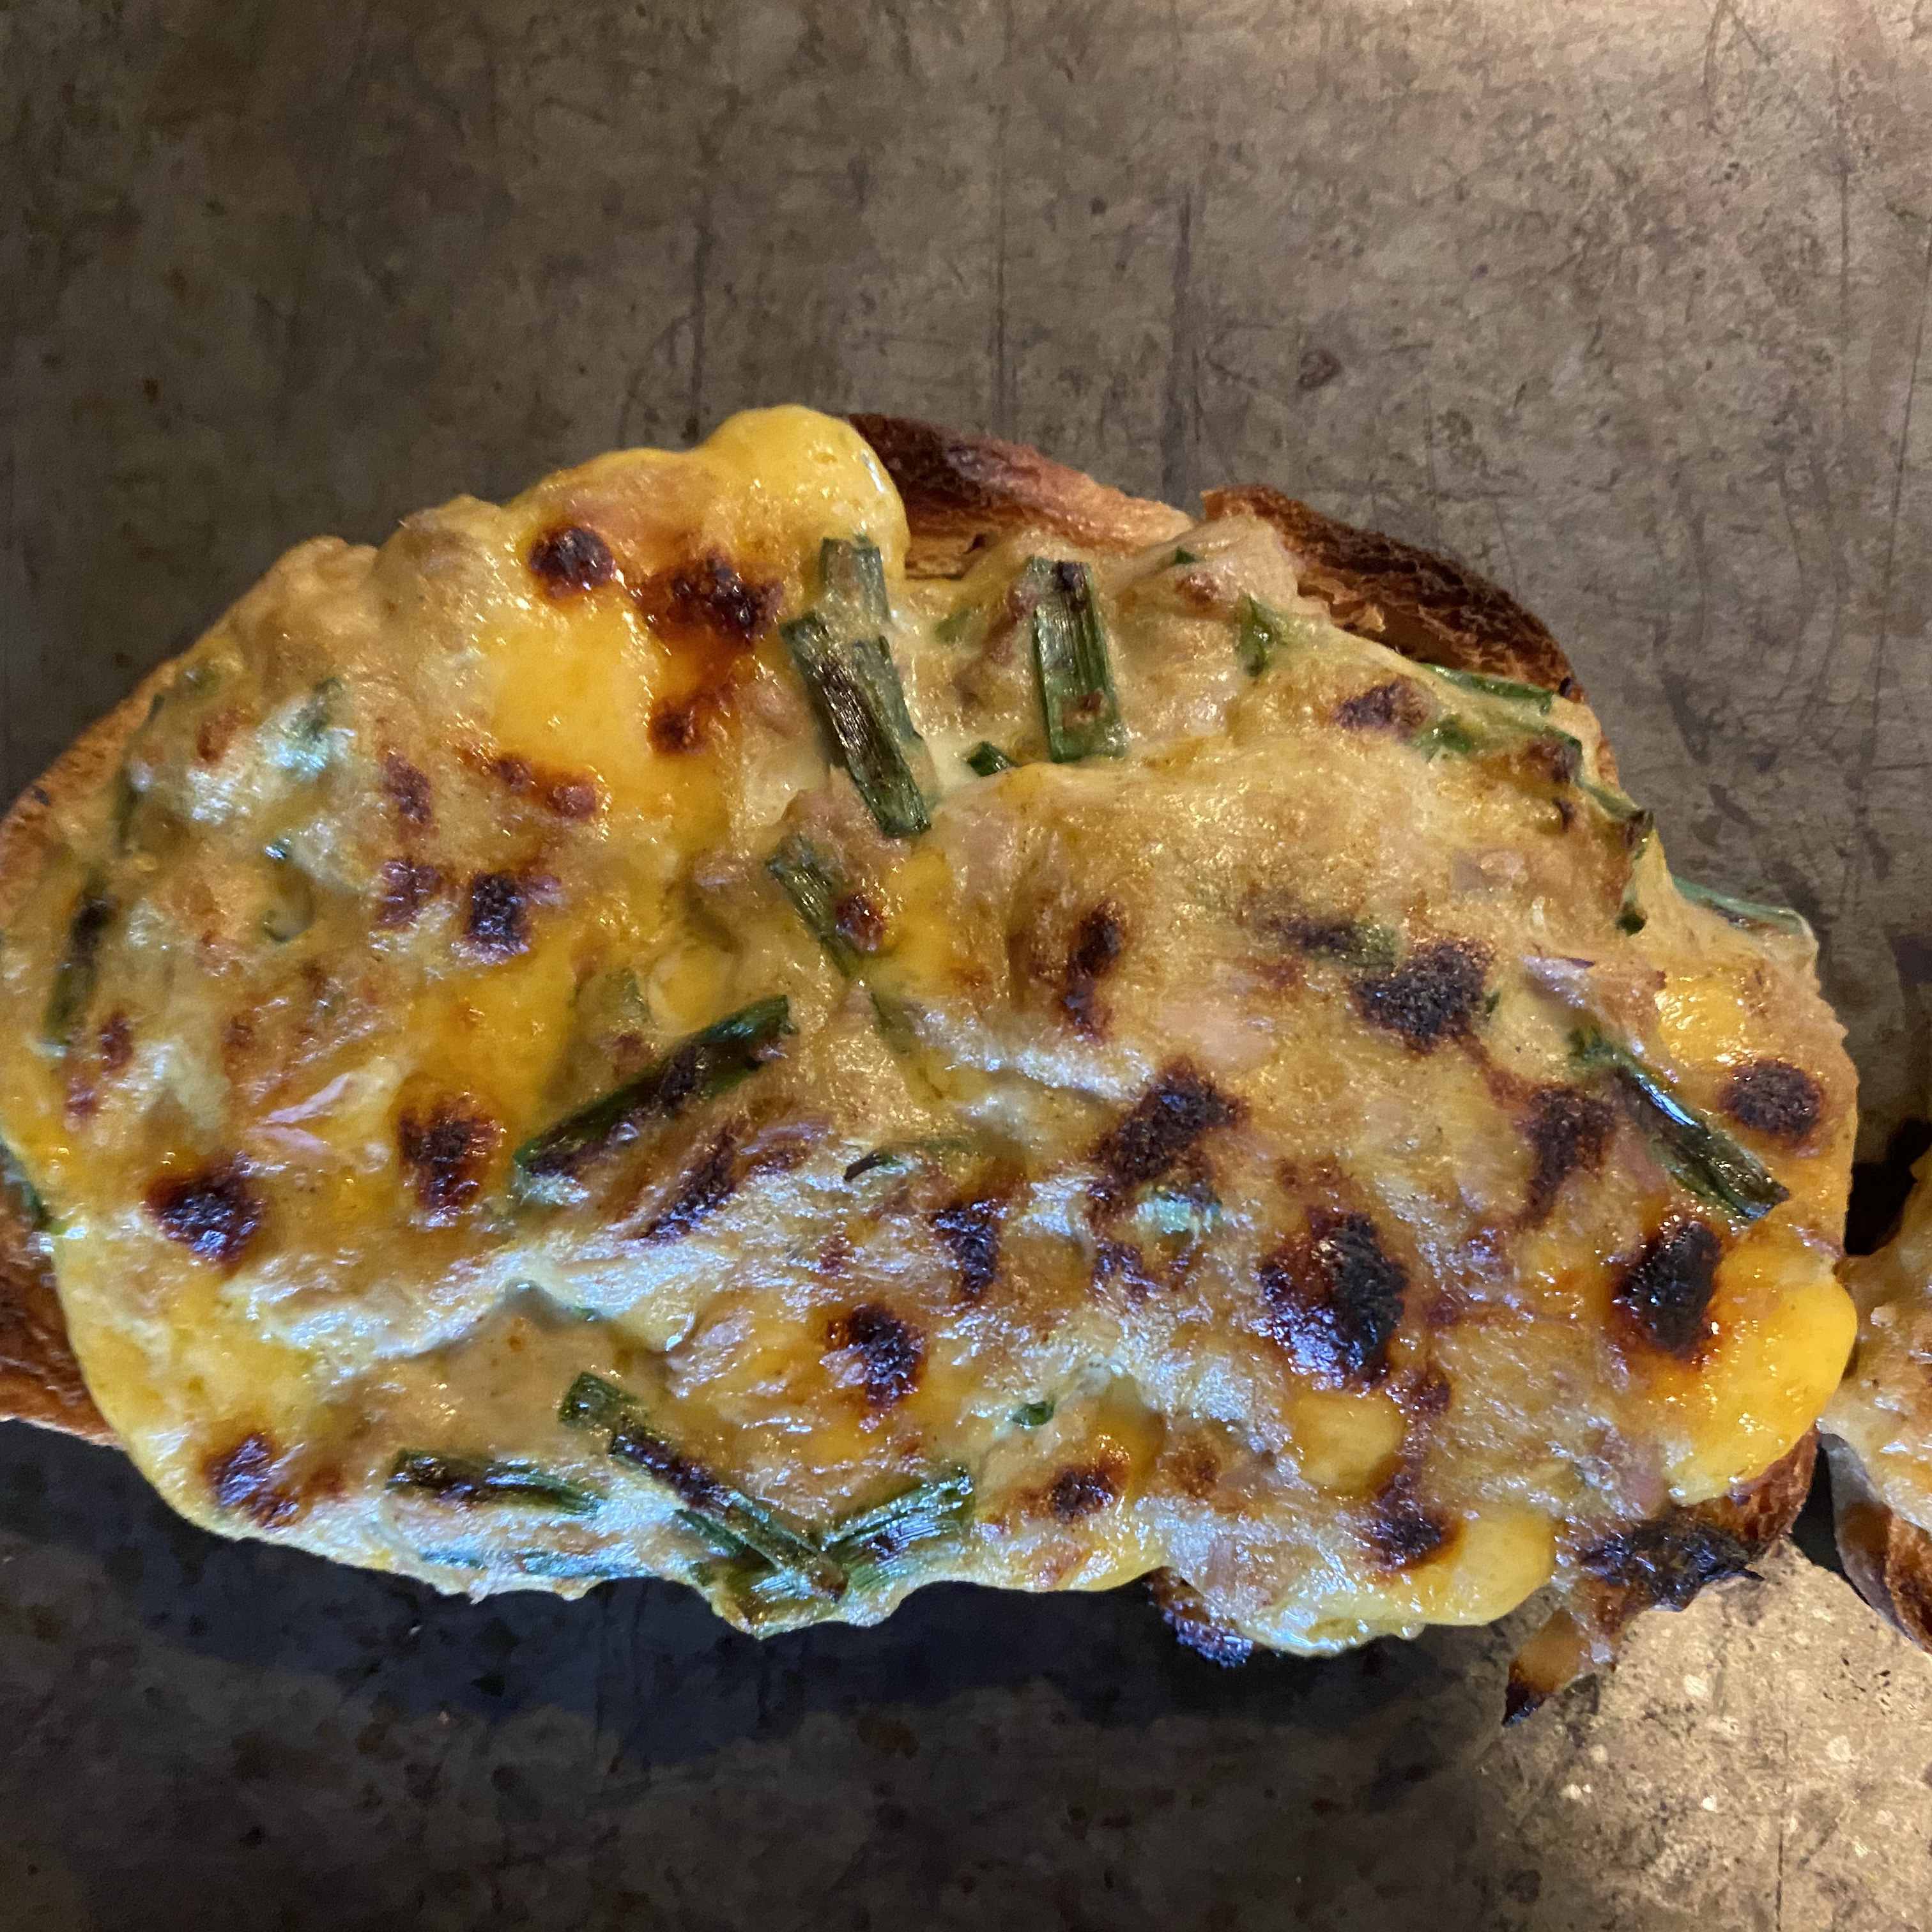 Hot Curried Tuna Sandwiches Karister